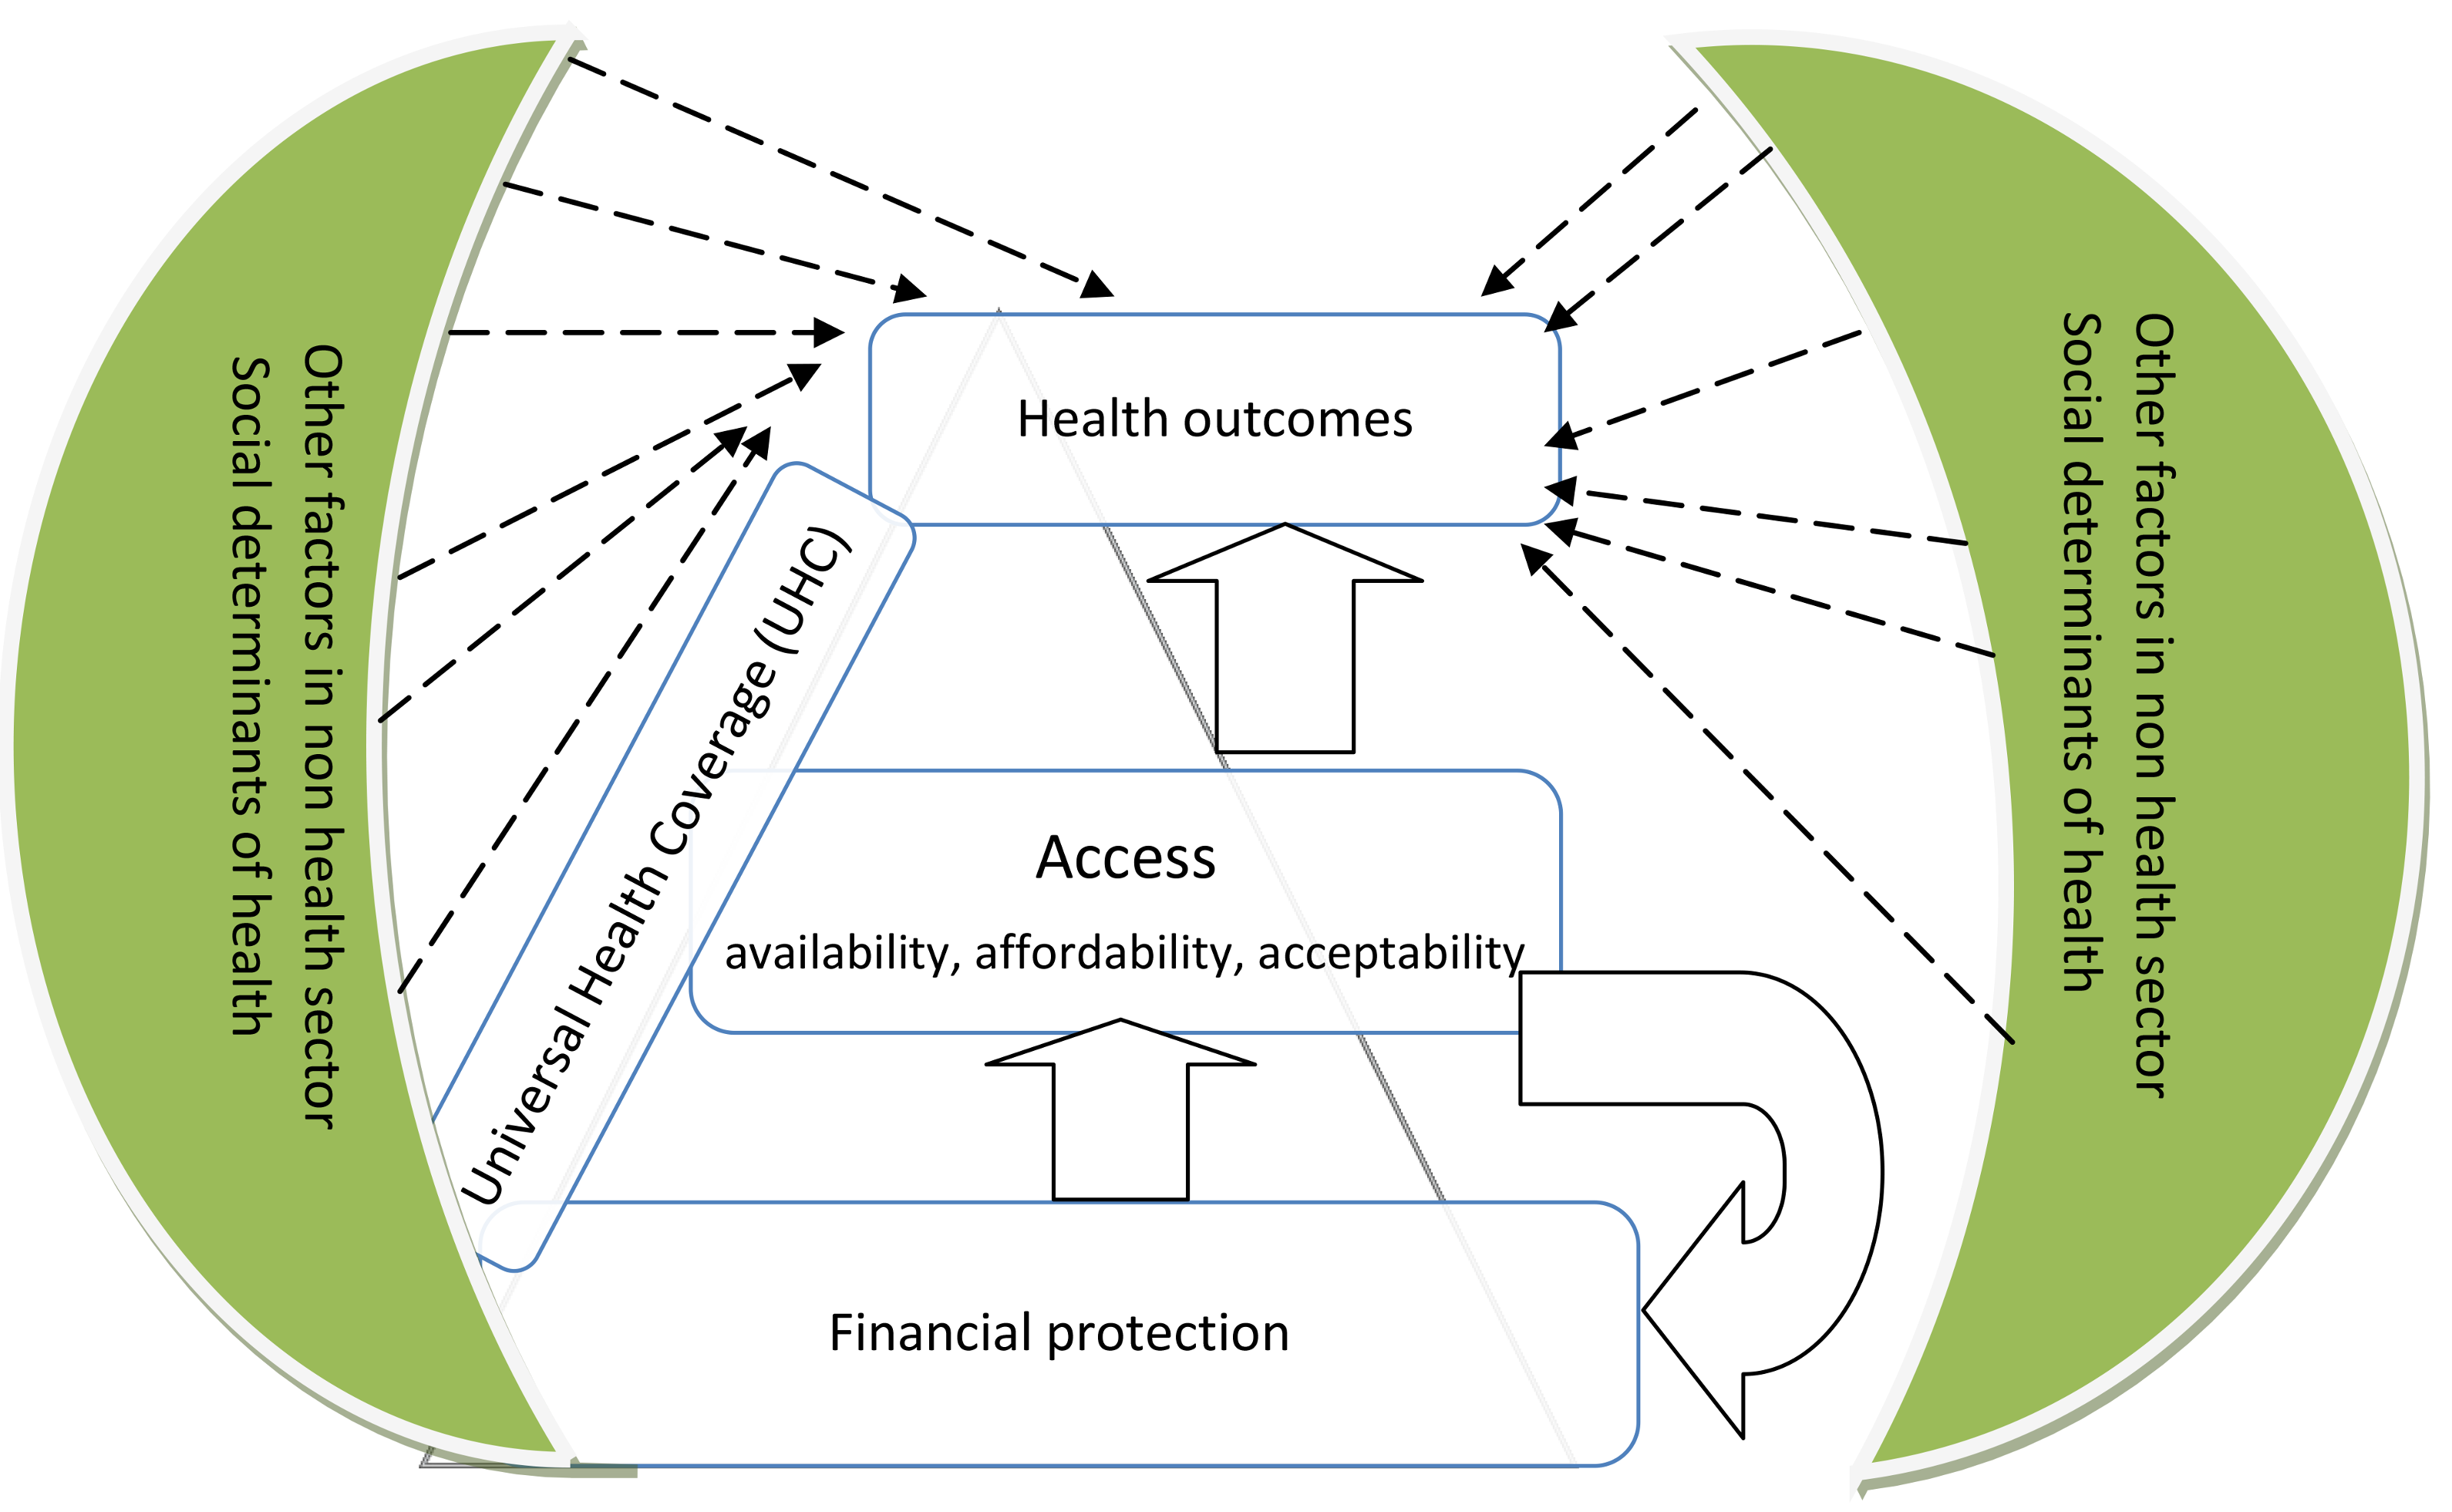 Universal health coverage assessment framework.